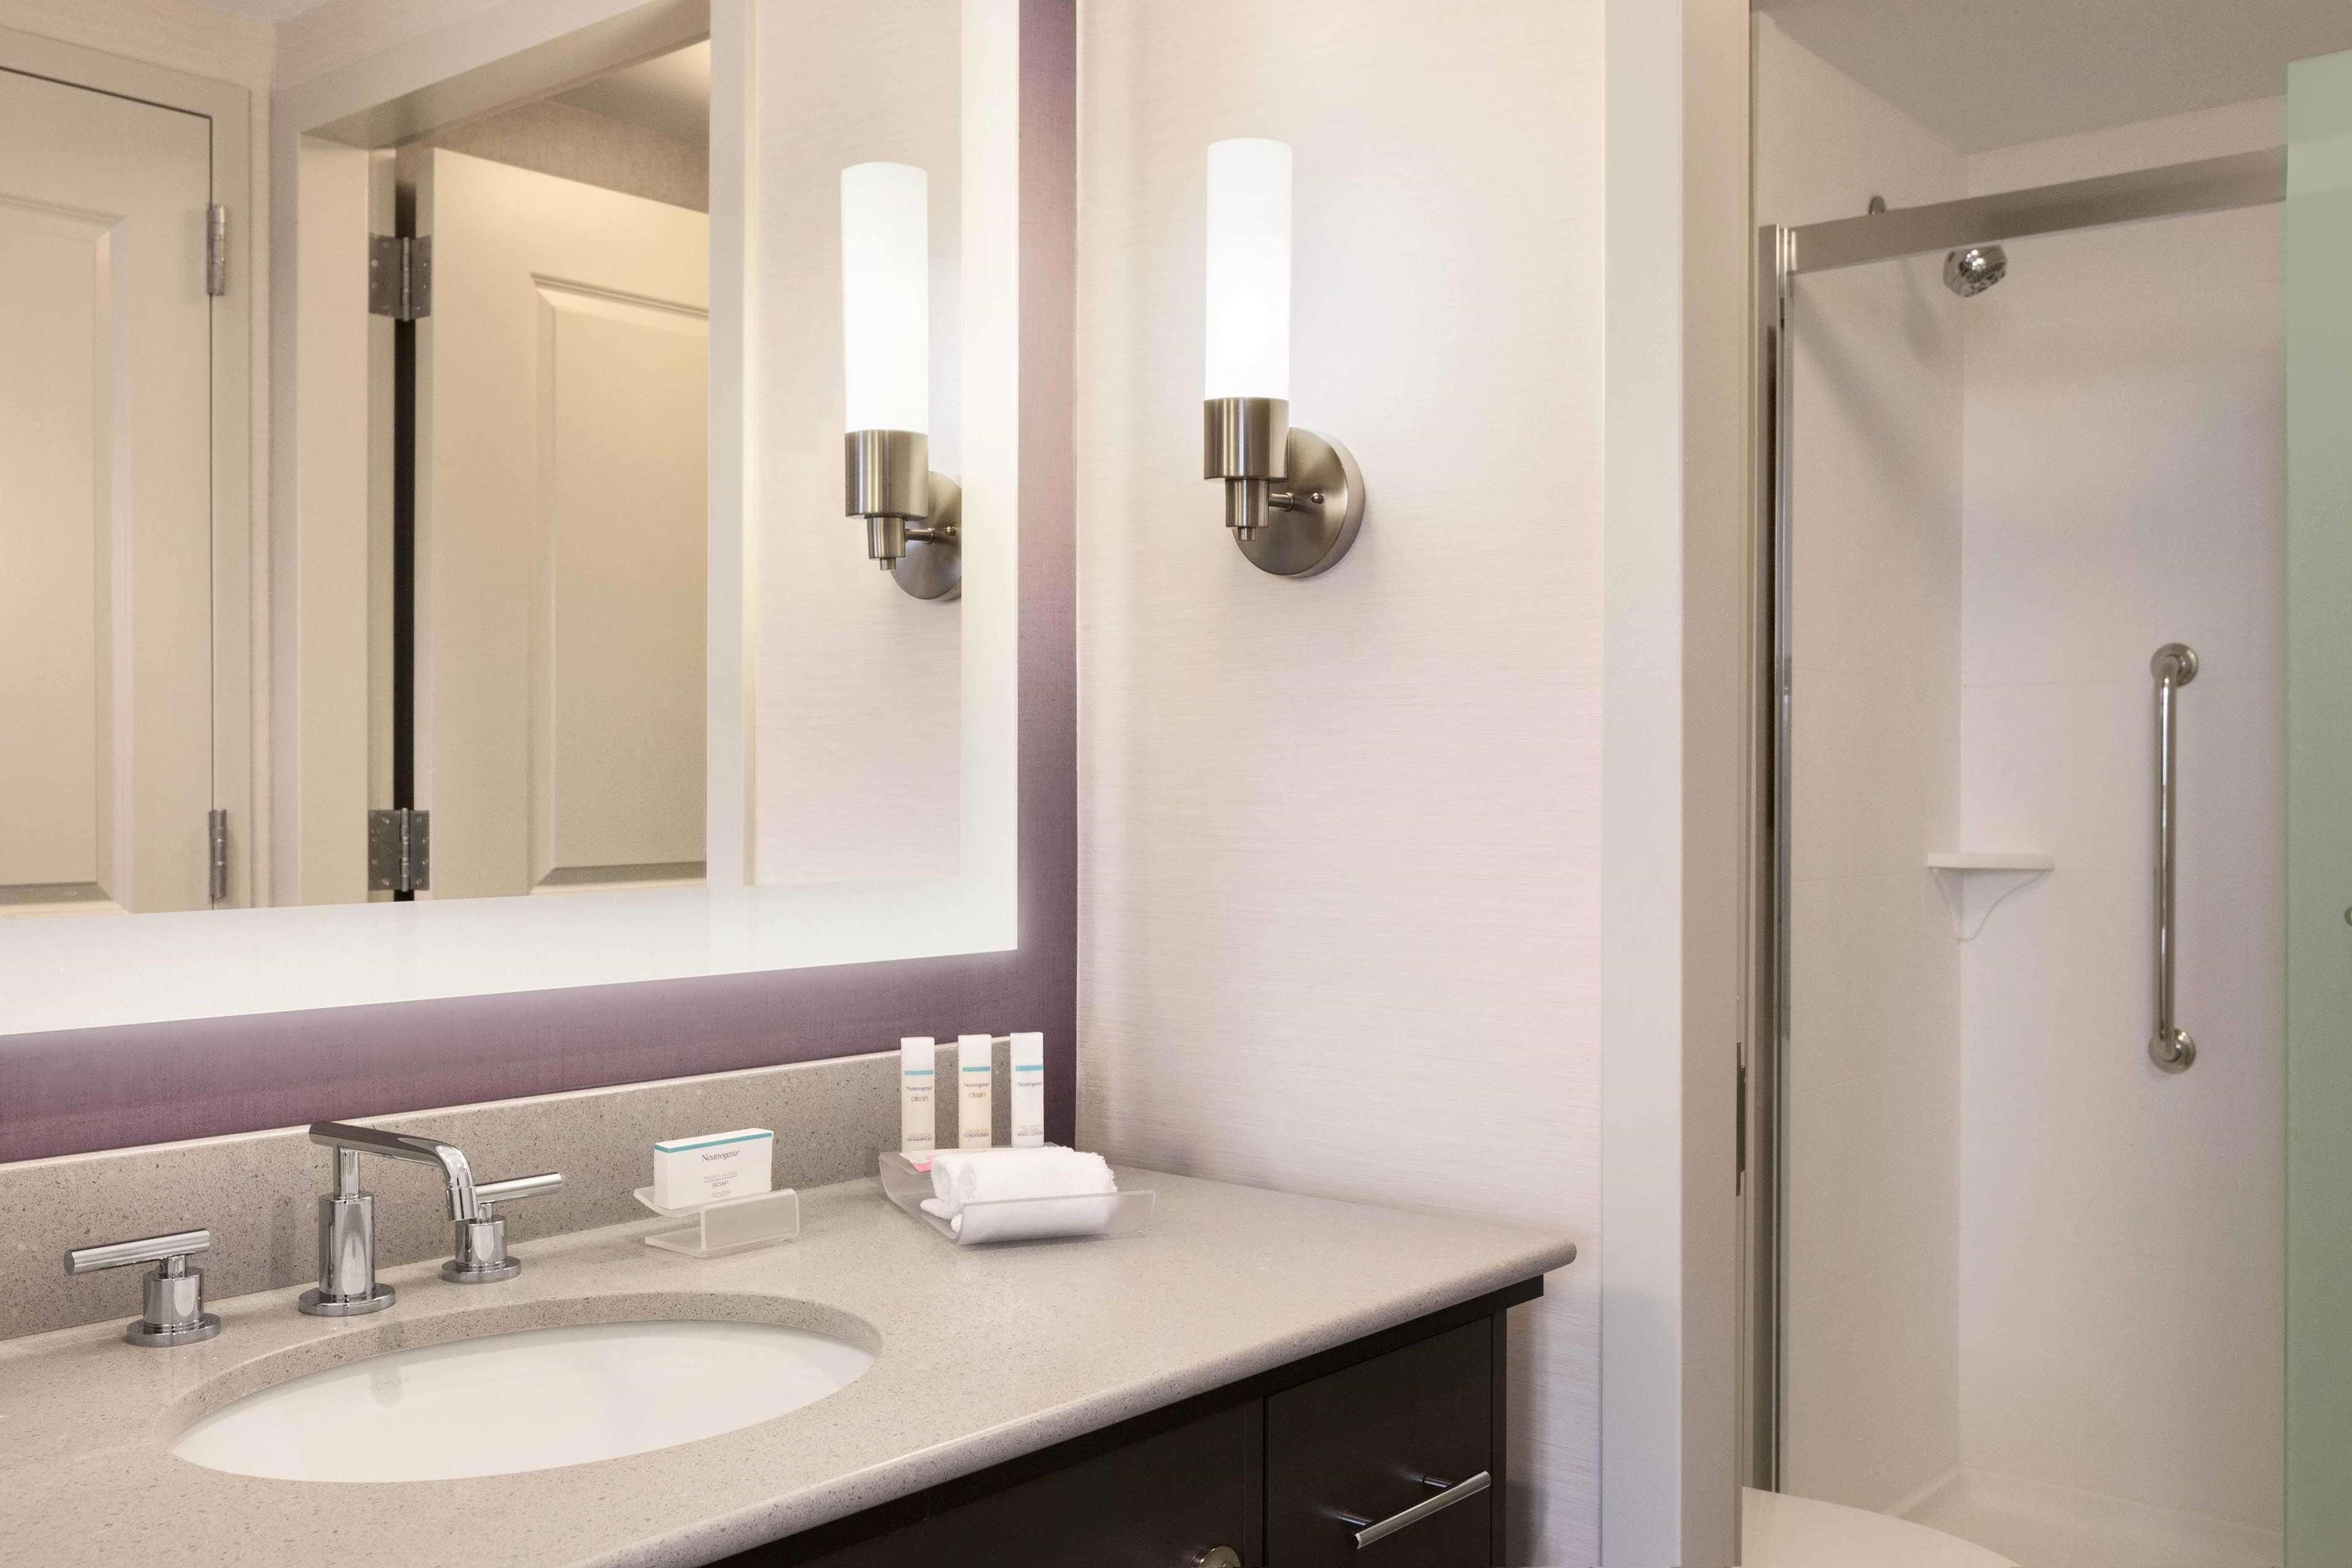 Homewood Suites by Hilton Washington DC Convention Center image 19